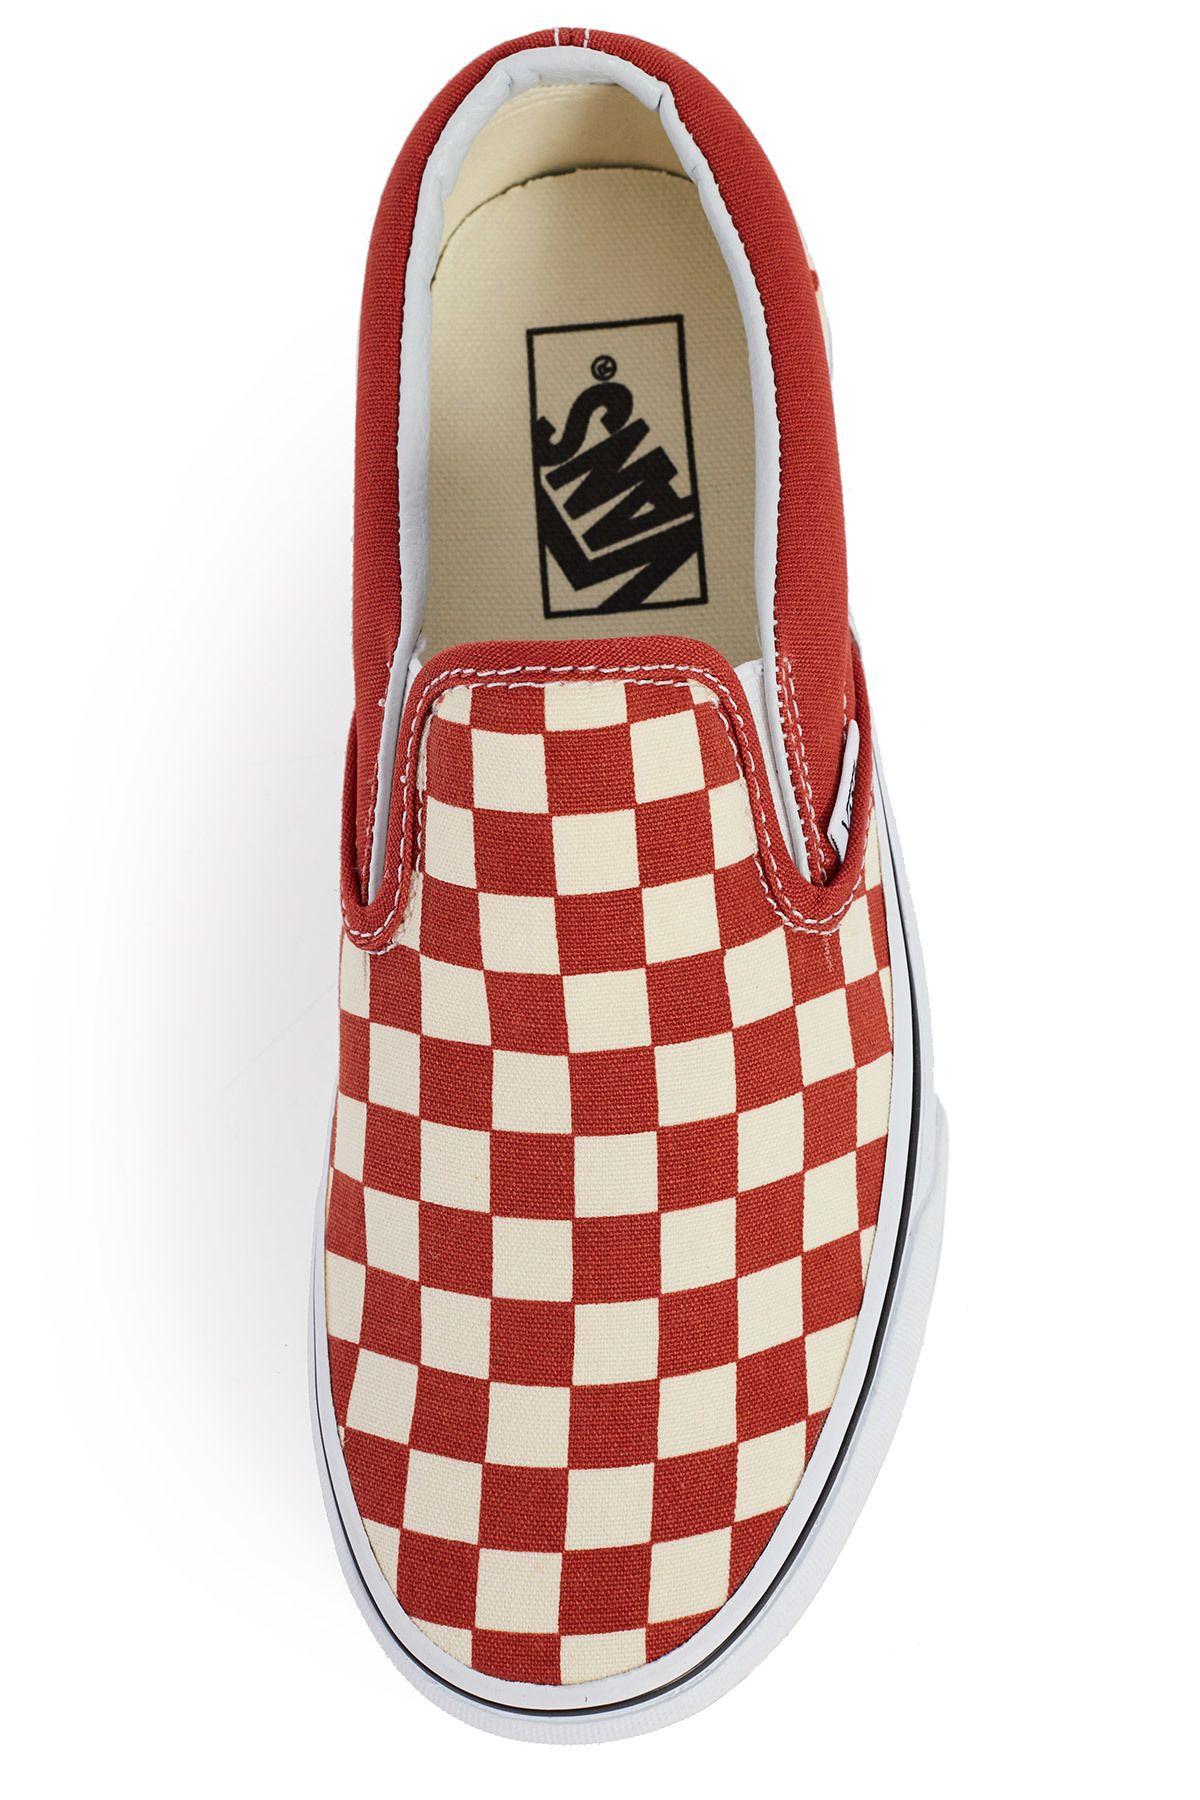 Vans | Classic Slip-On Hot Sauce